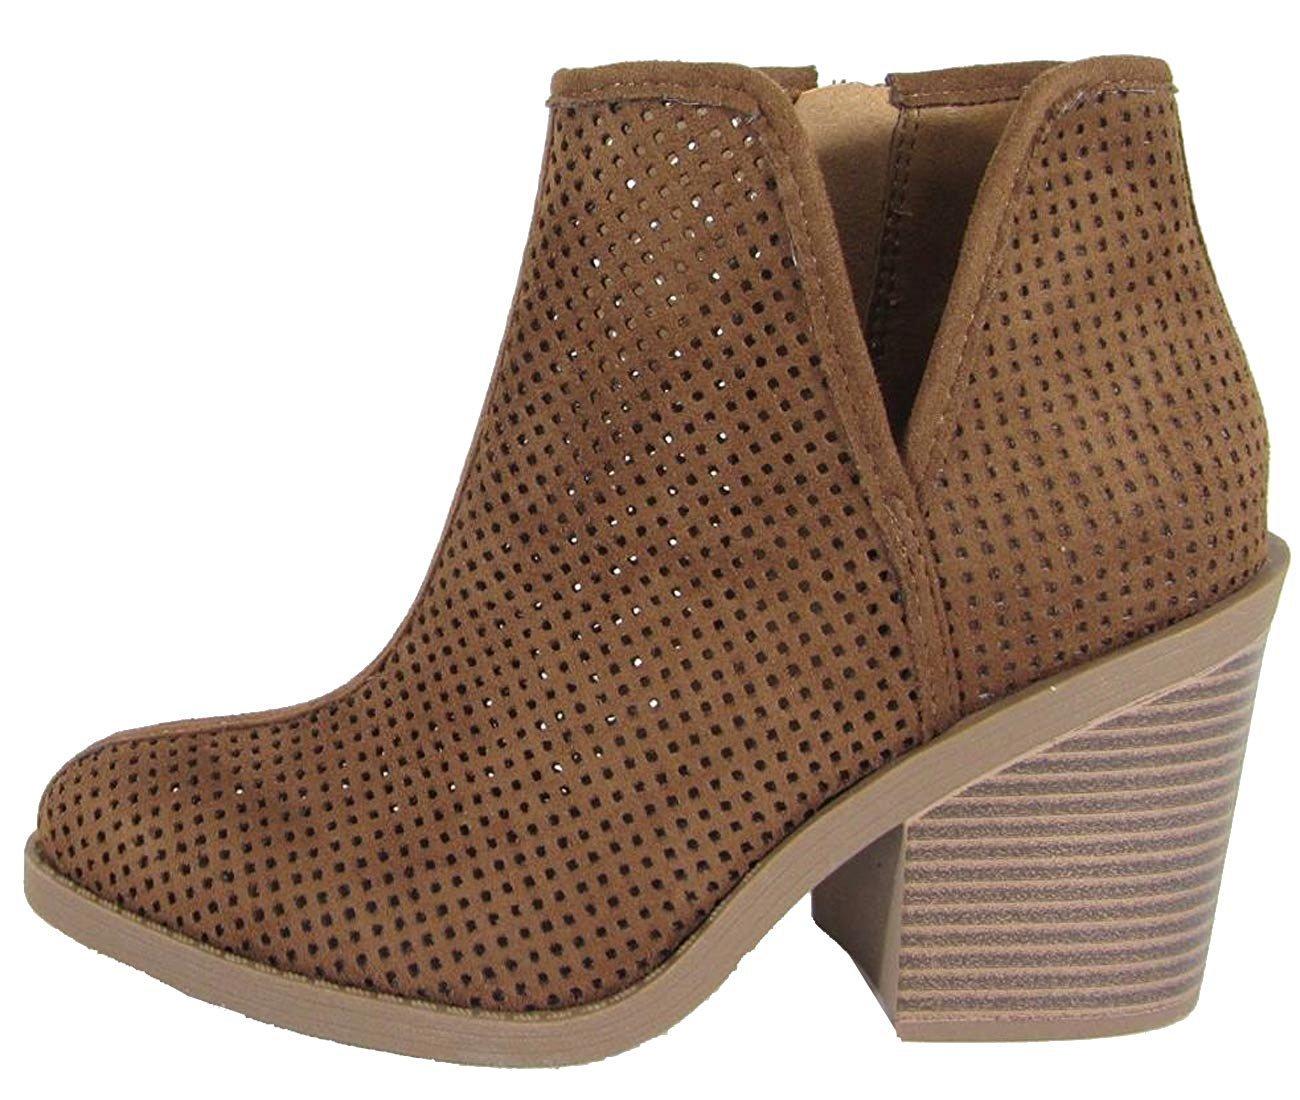 MVE Shoes SodaWomens Tarpon Perforated Stacked Block Heel Ankle Bootie B074HG6RYY 8.5 B(M) US|Cognac Isu